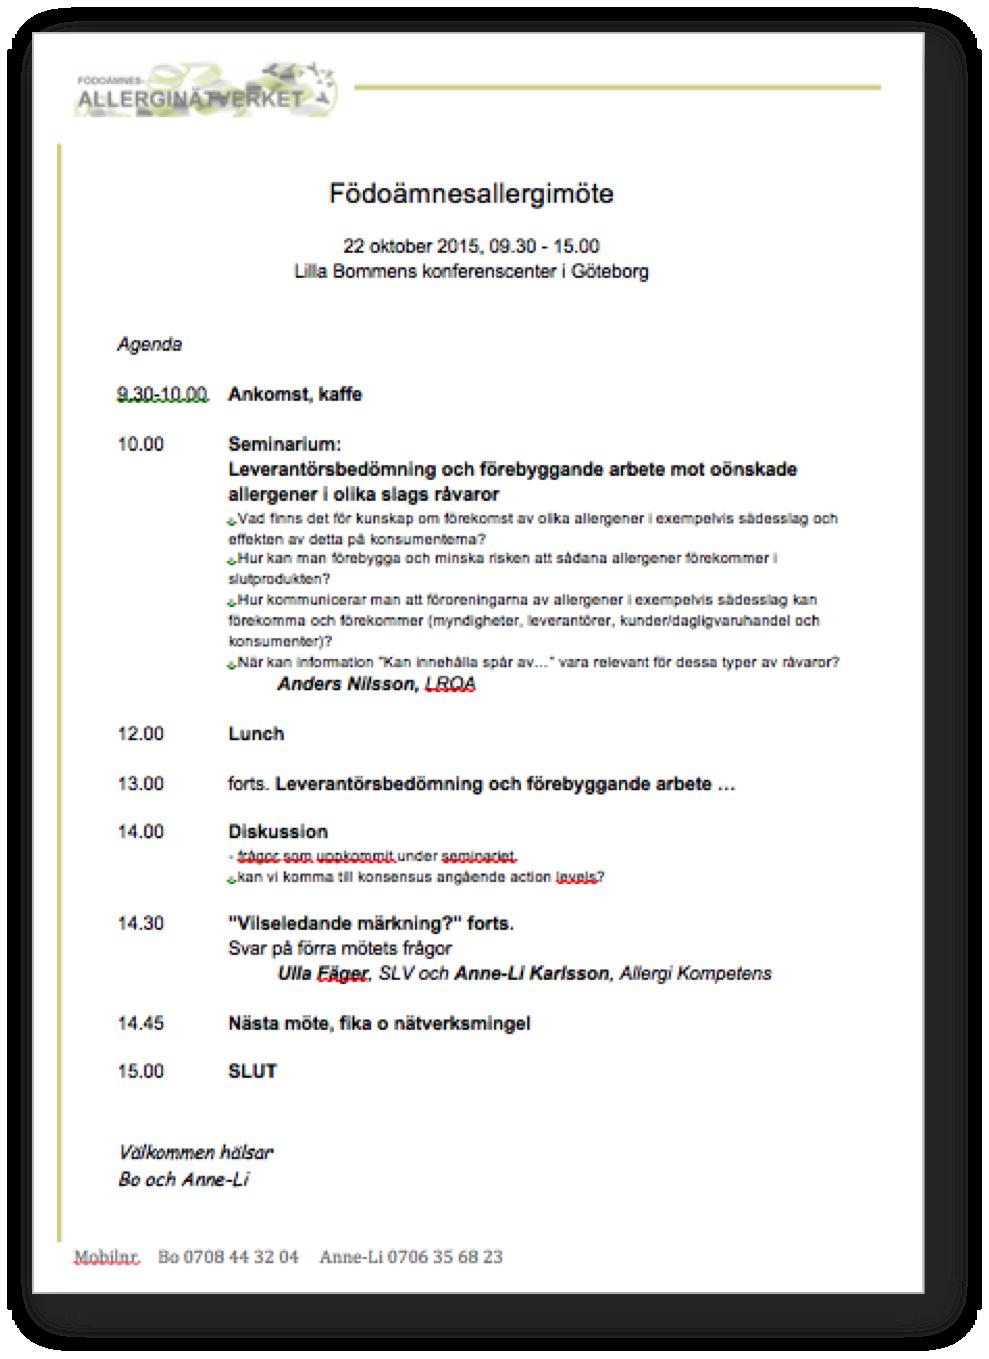 Agenda 22 okt 2015